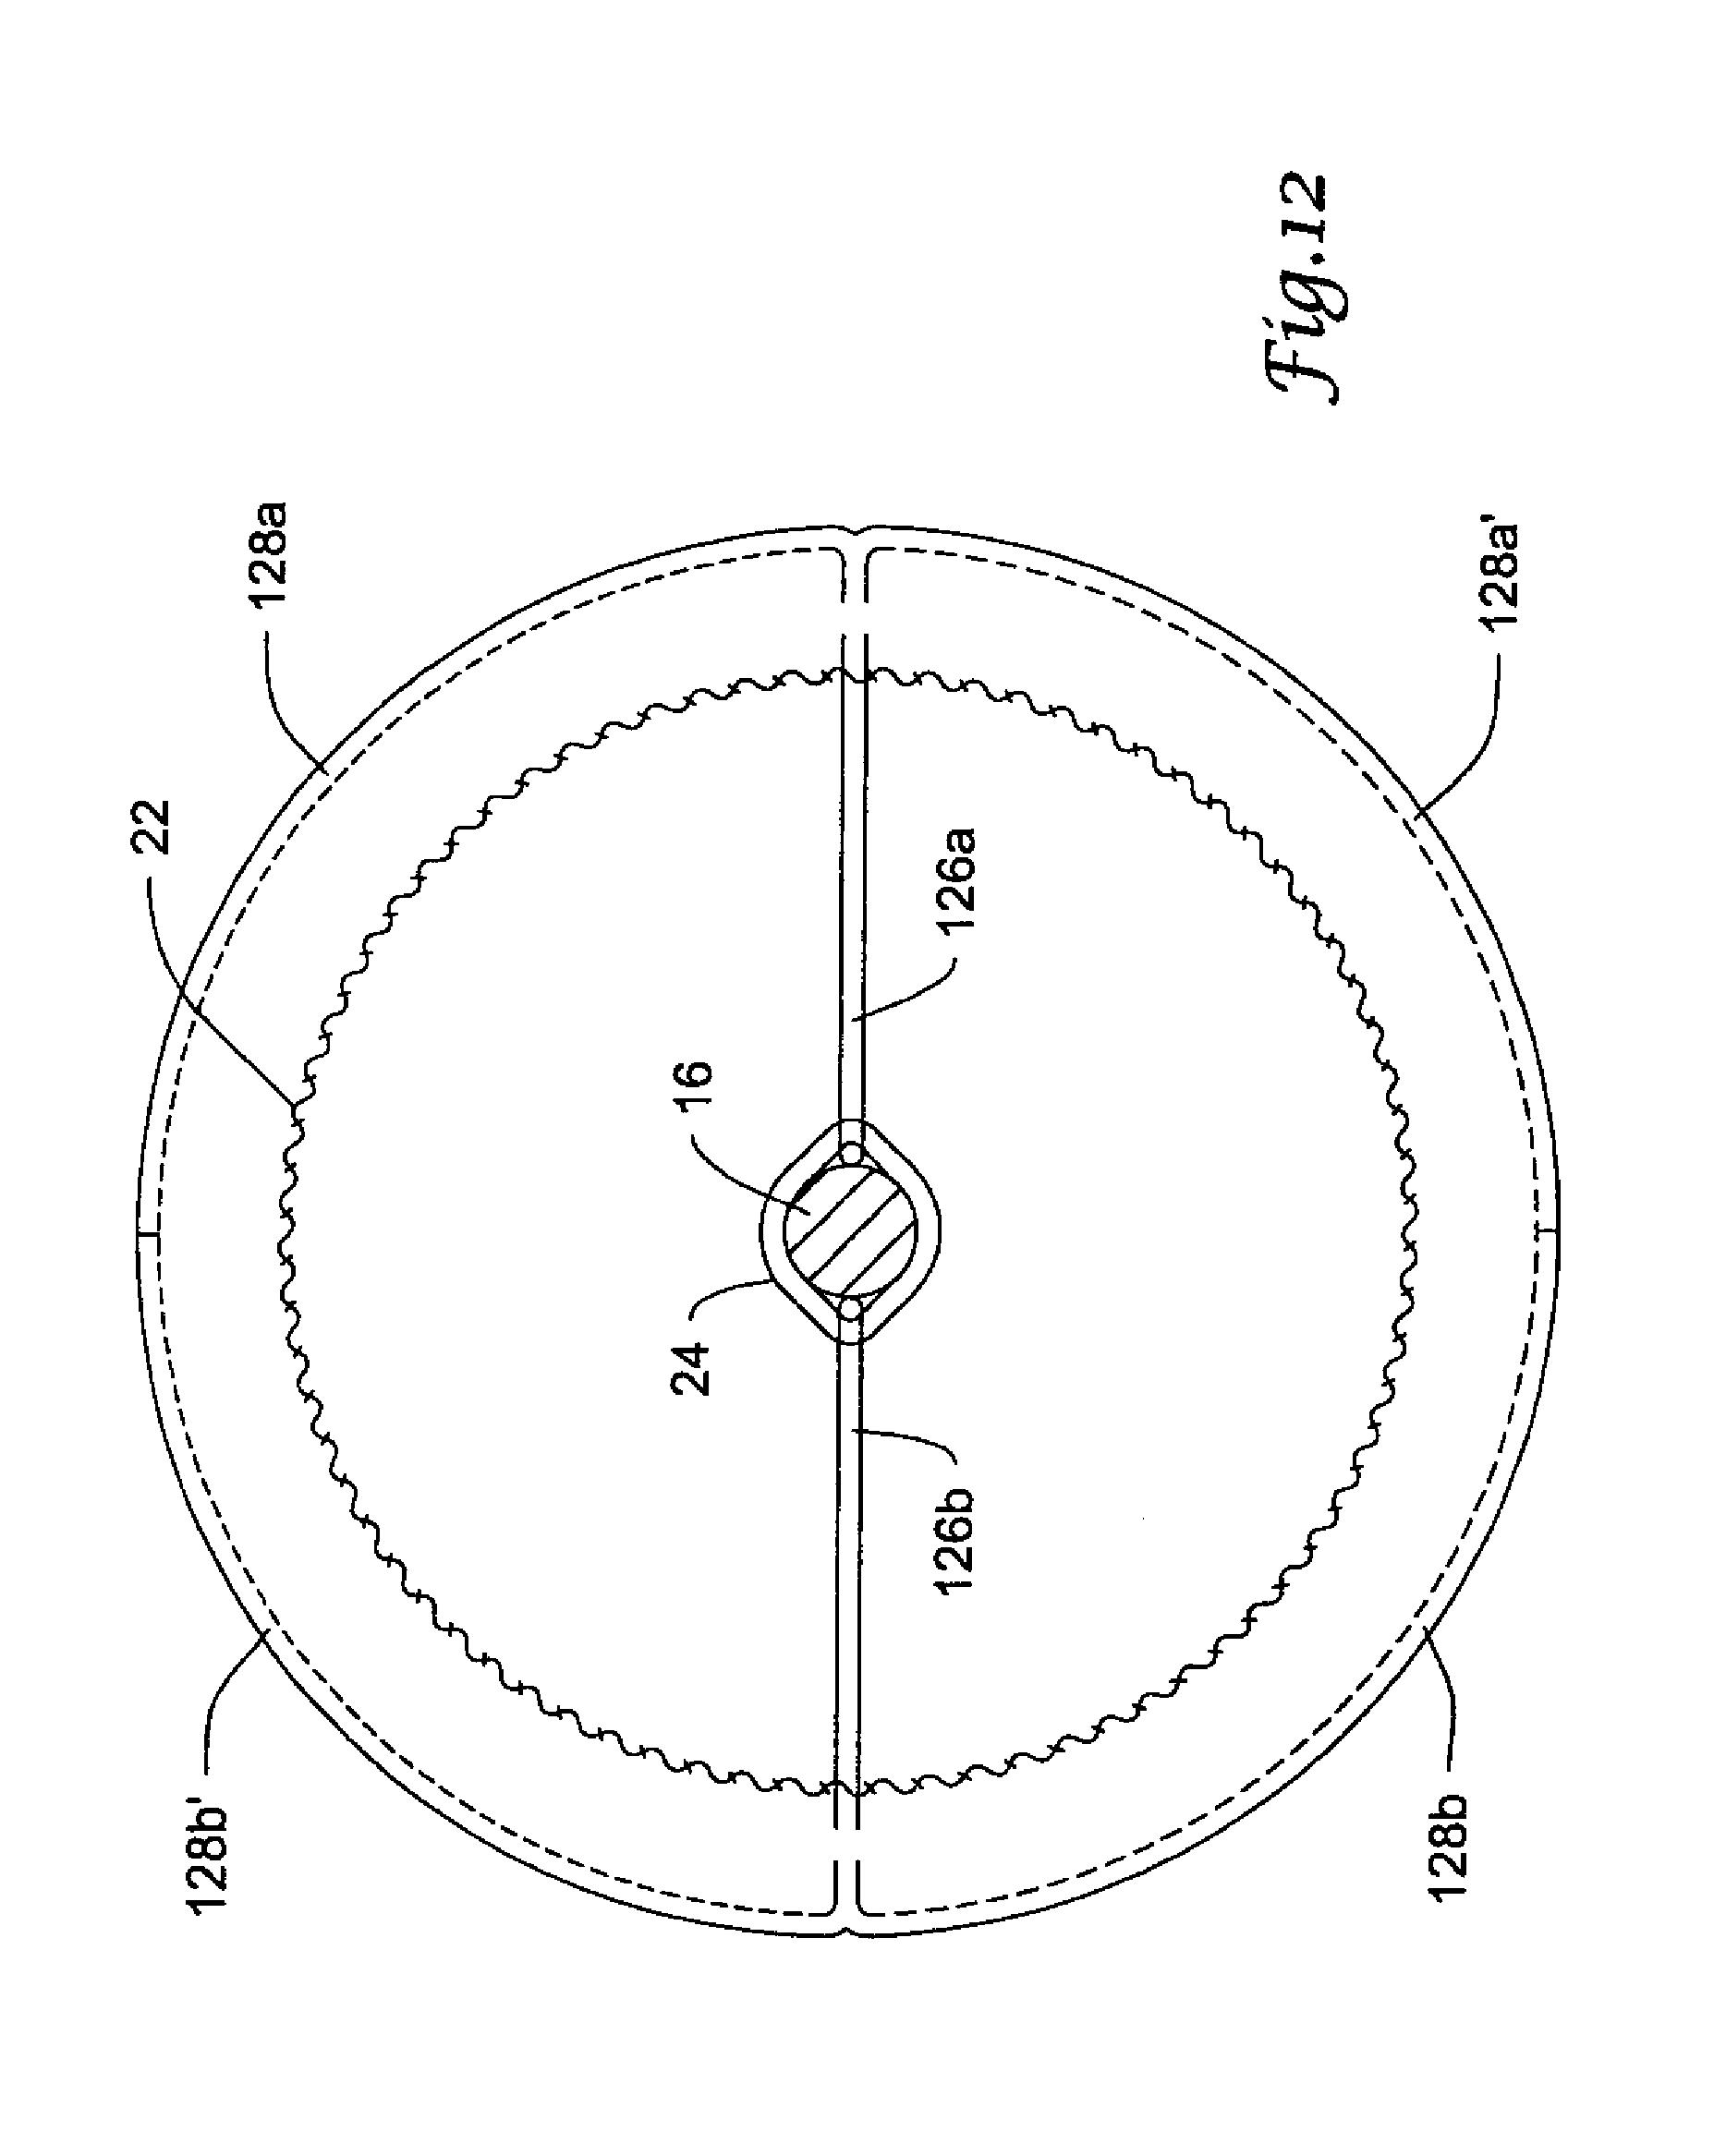 US8007510 besides US7875051 in addition Melanotan Ii Acetate Salt Cas 121062 08 6 besides US7875051 together with US8007510. on filter scientific method